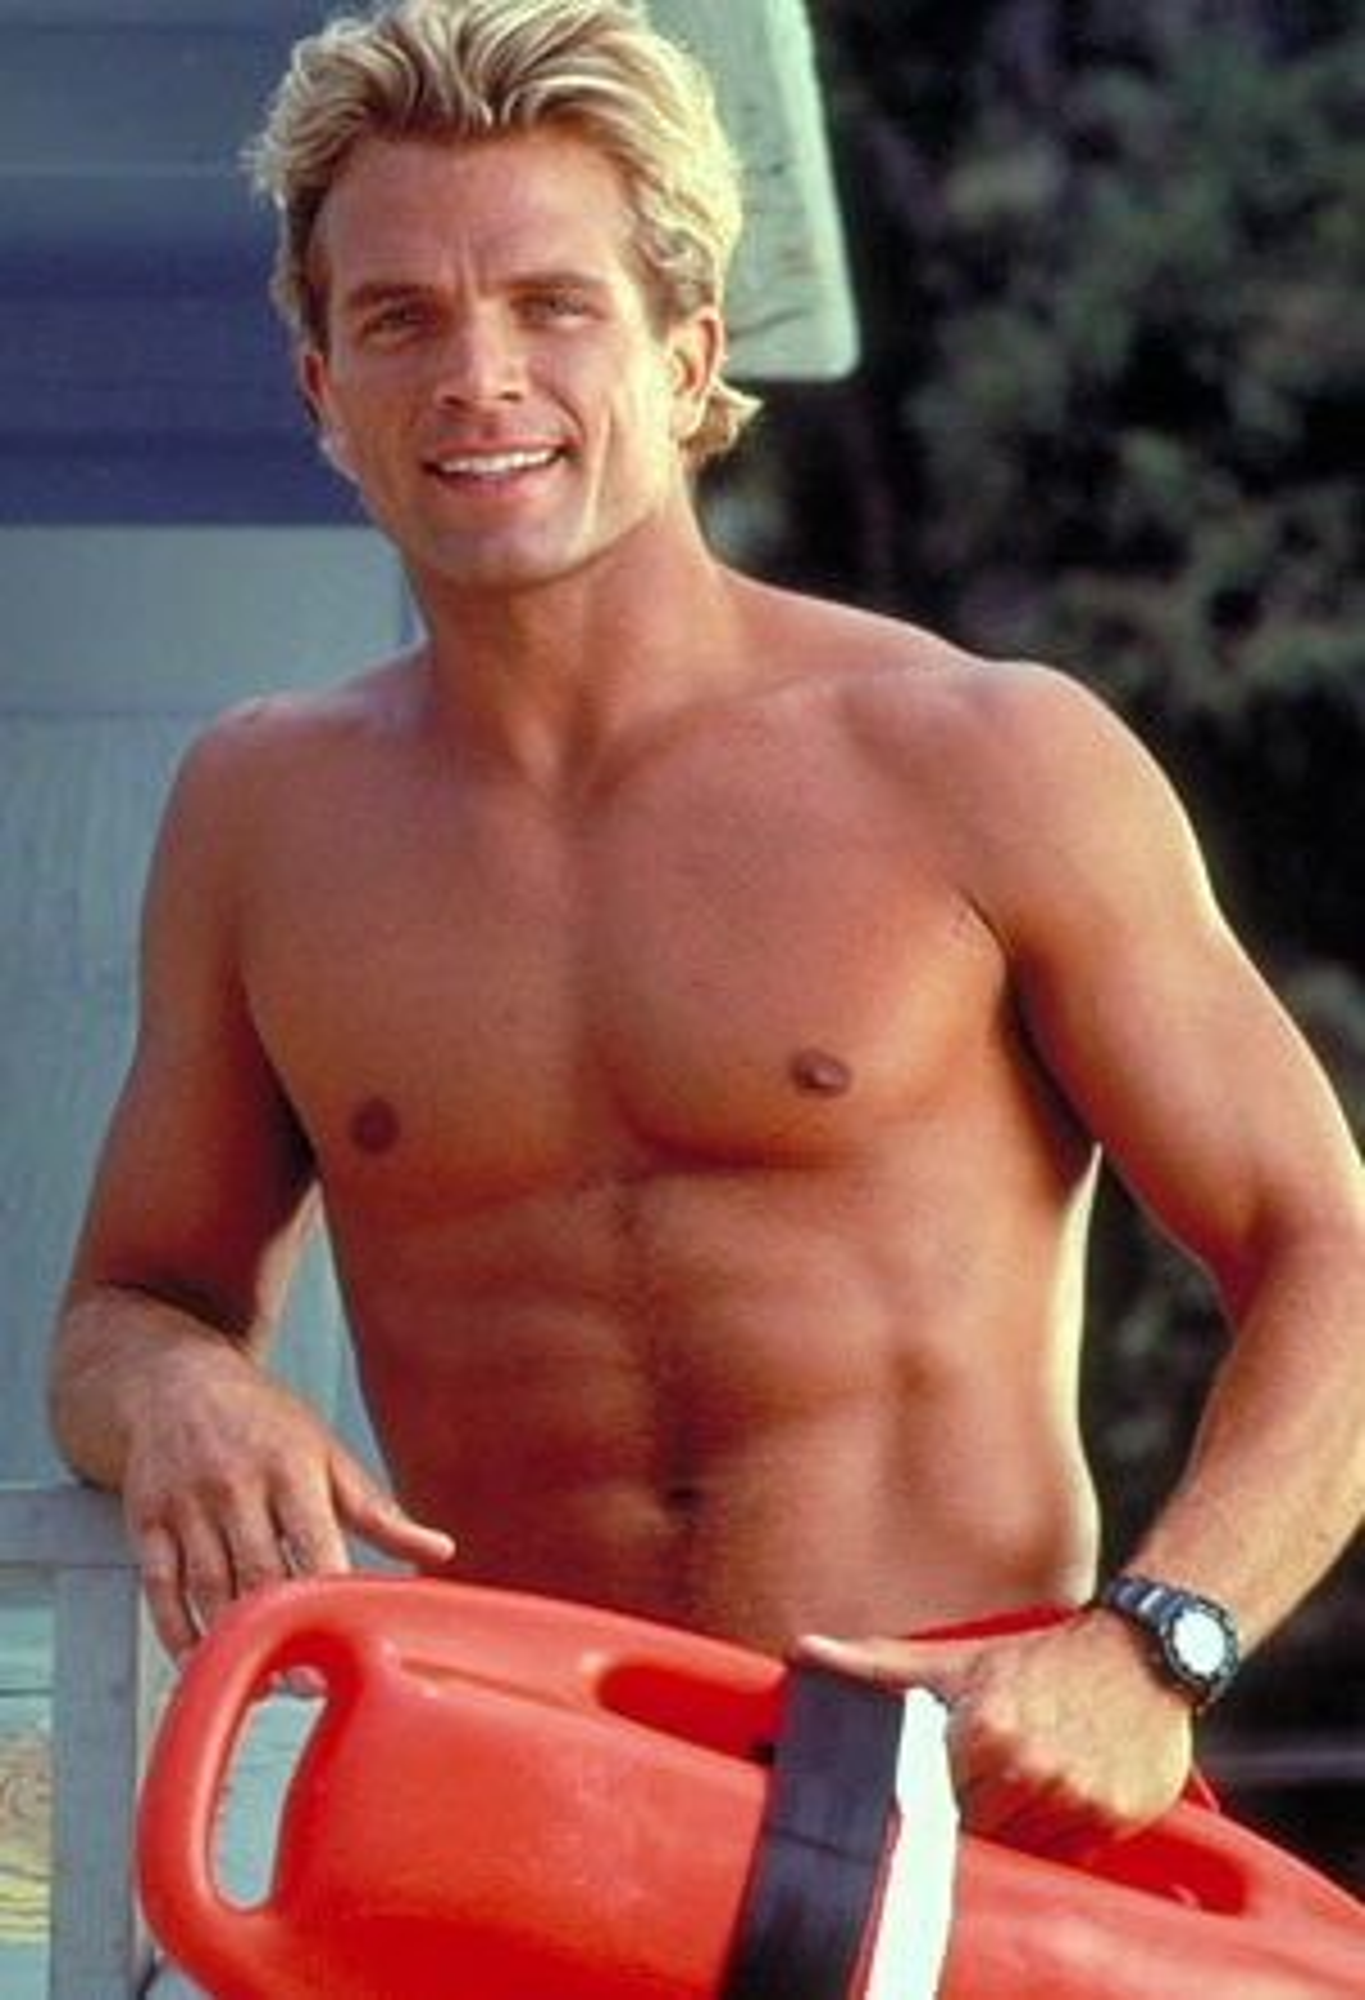 Cody Madison